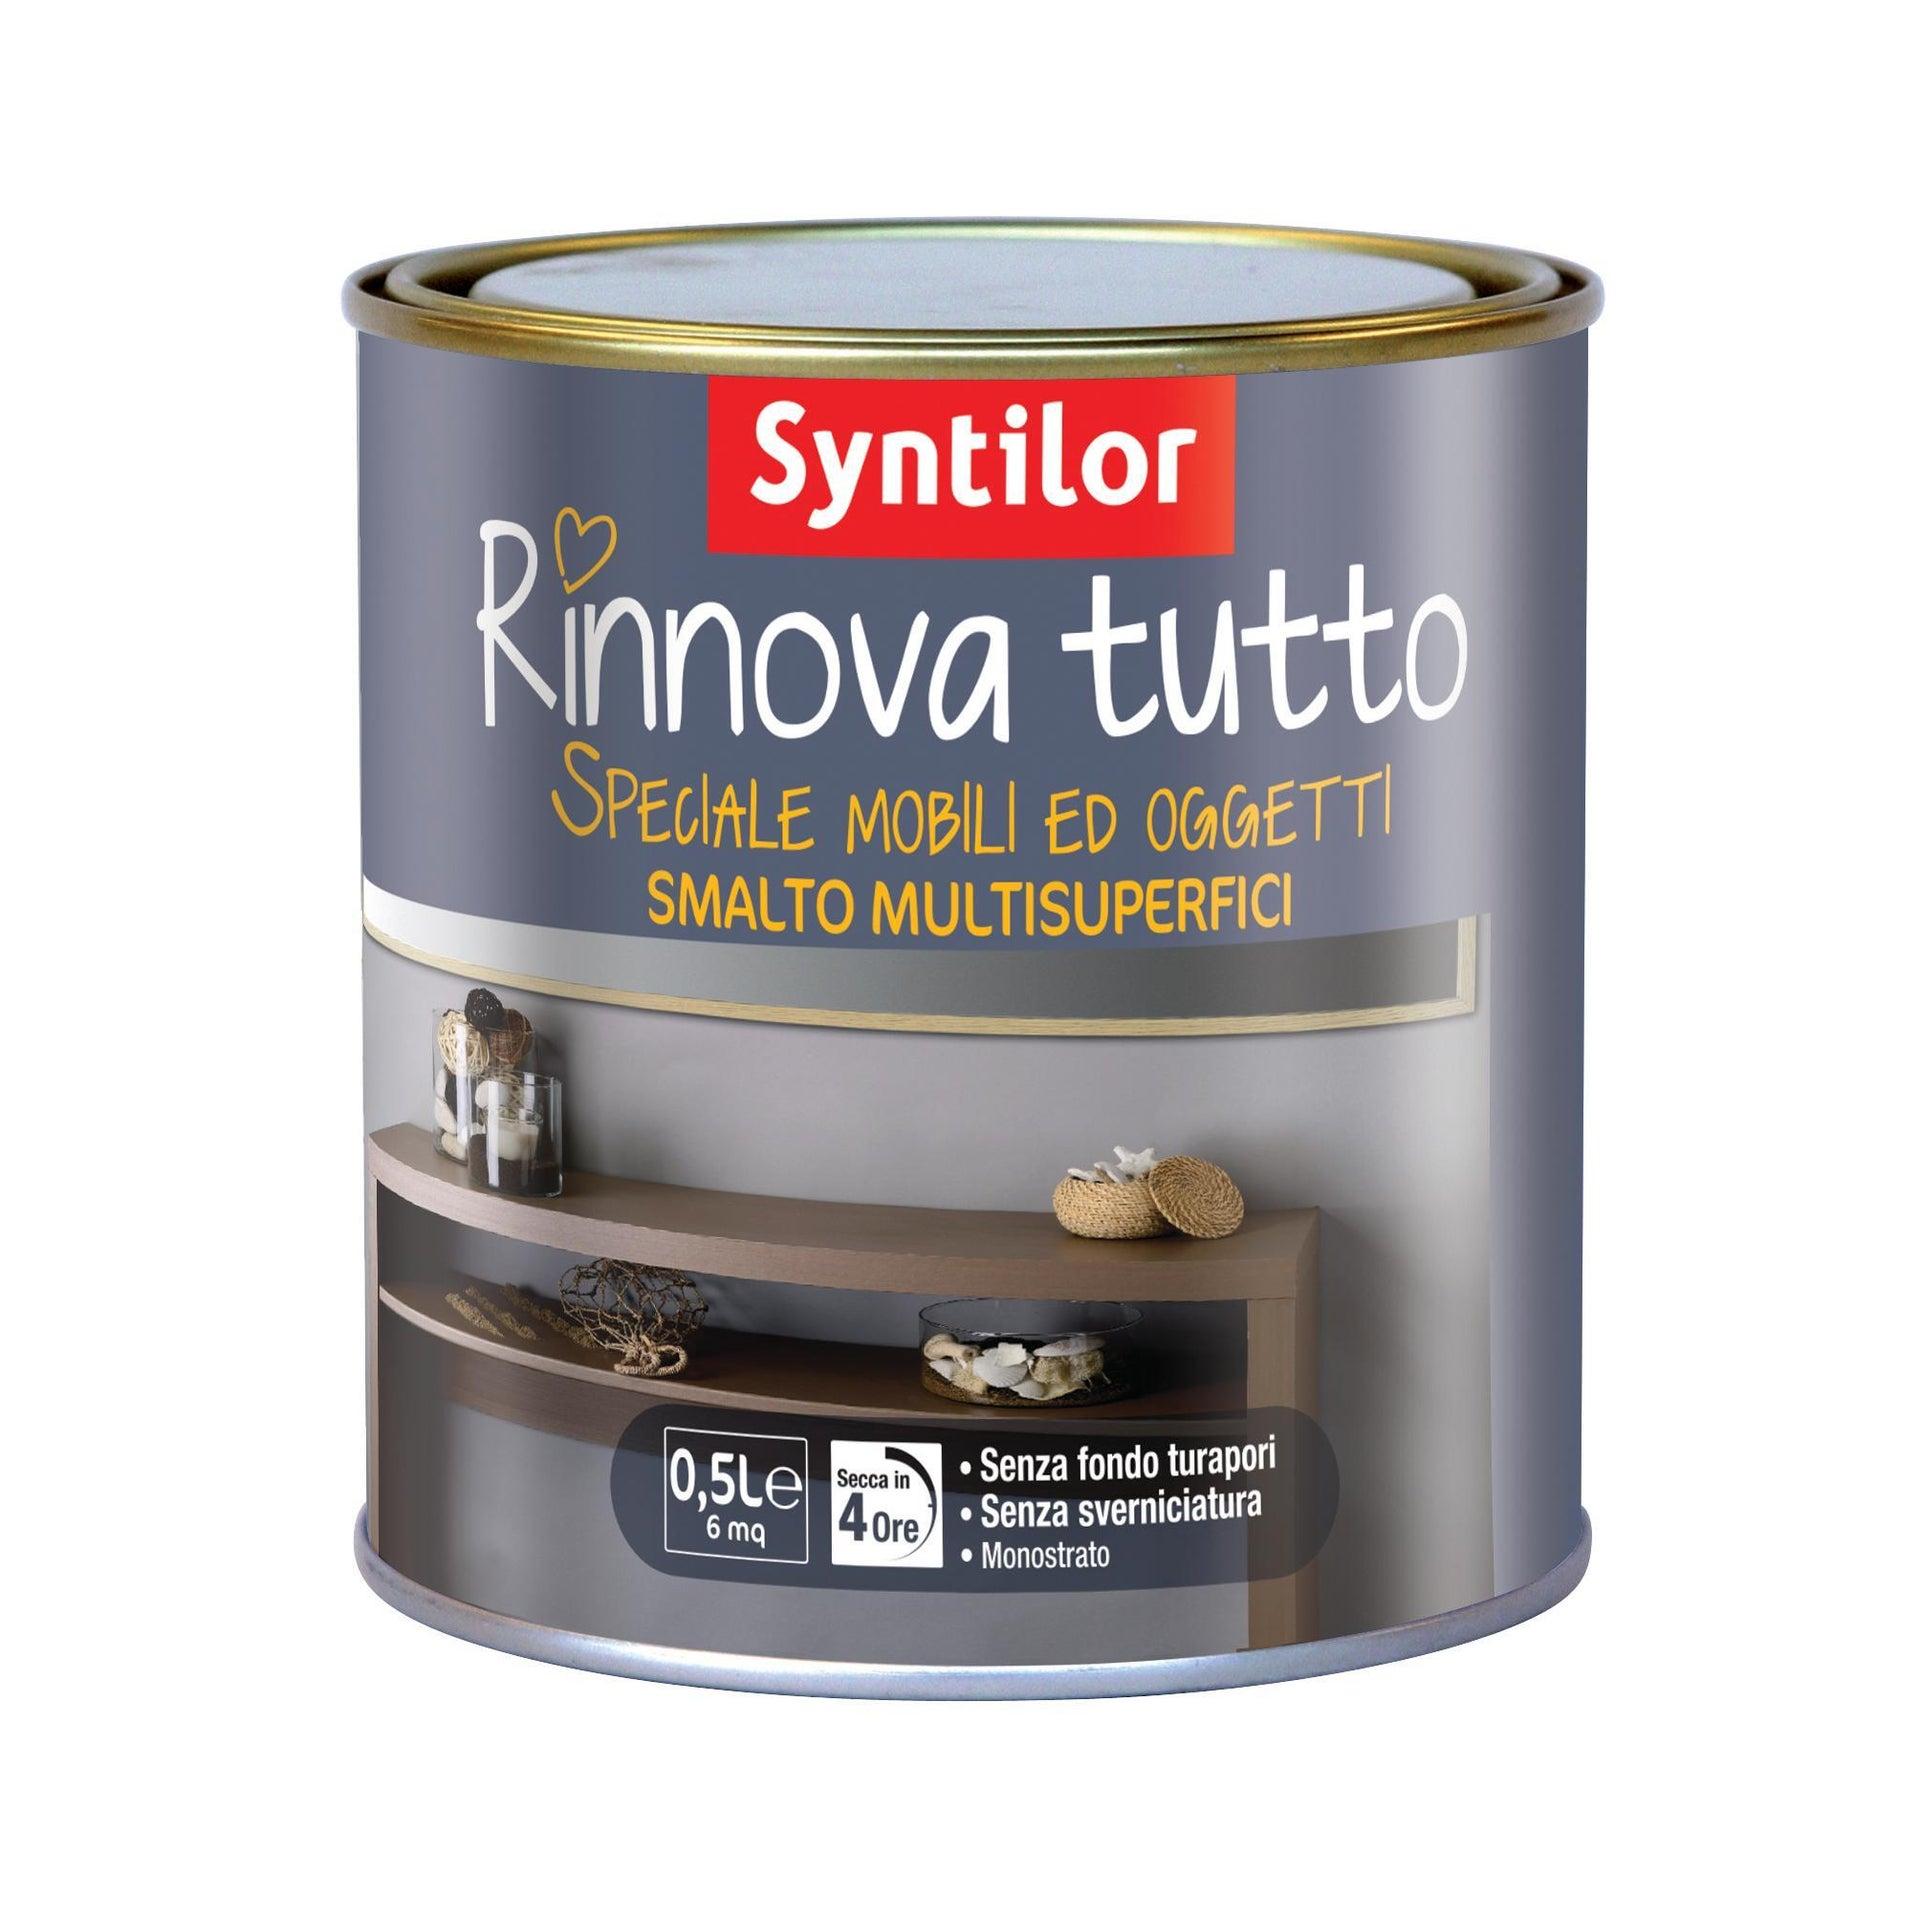 Smalto mobile cucina SYNTILOR 0.5 l nero - 2